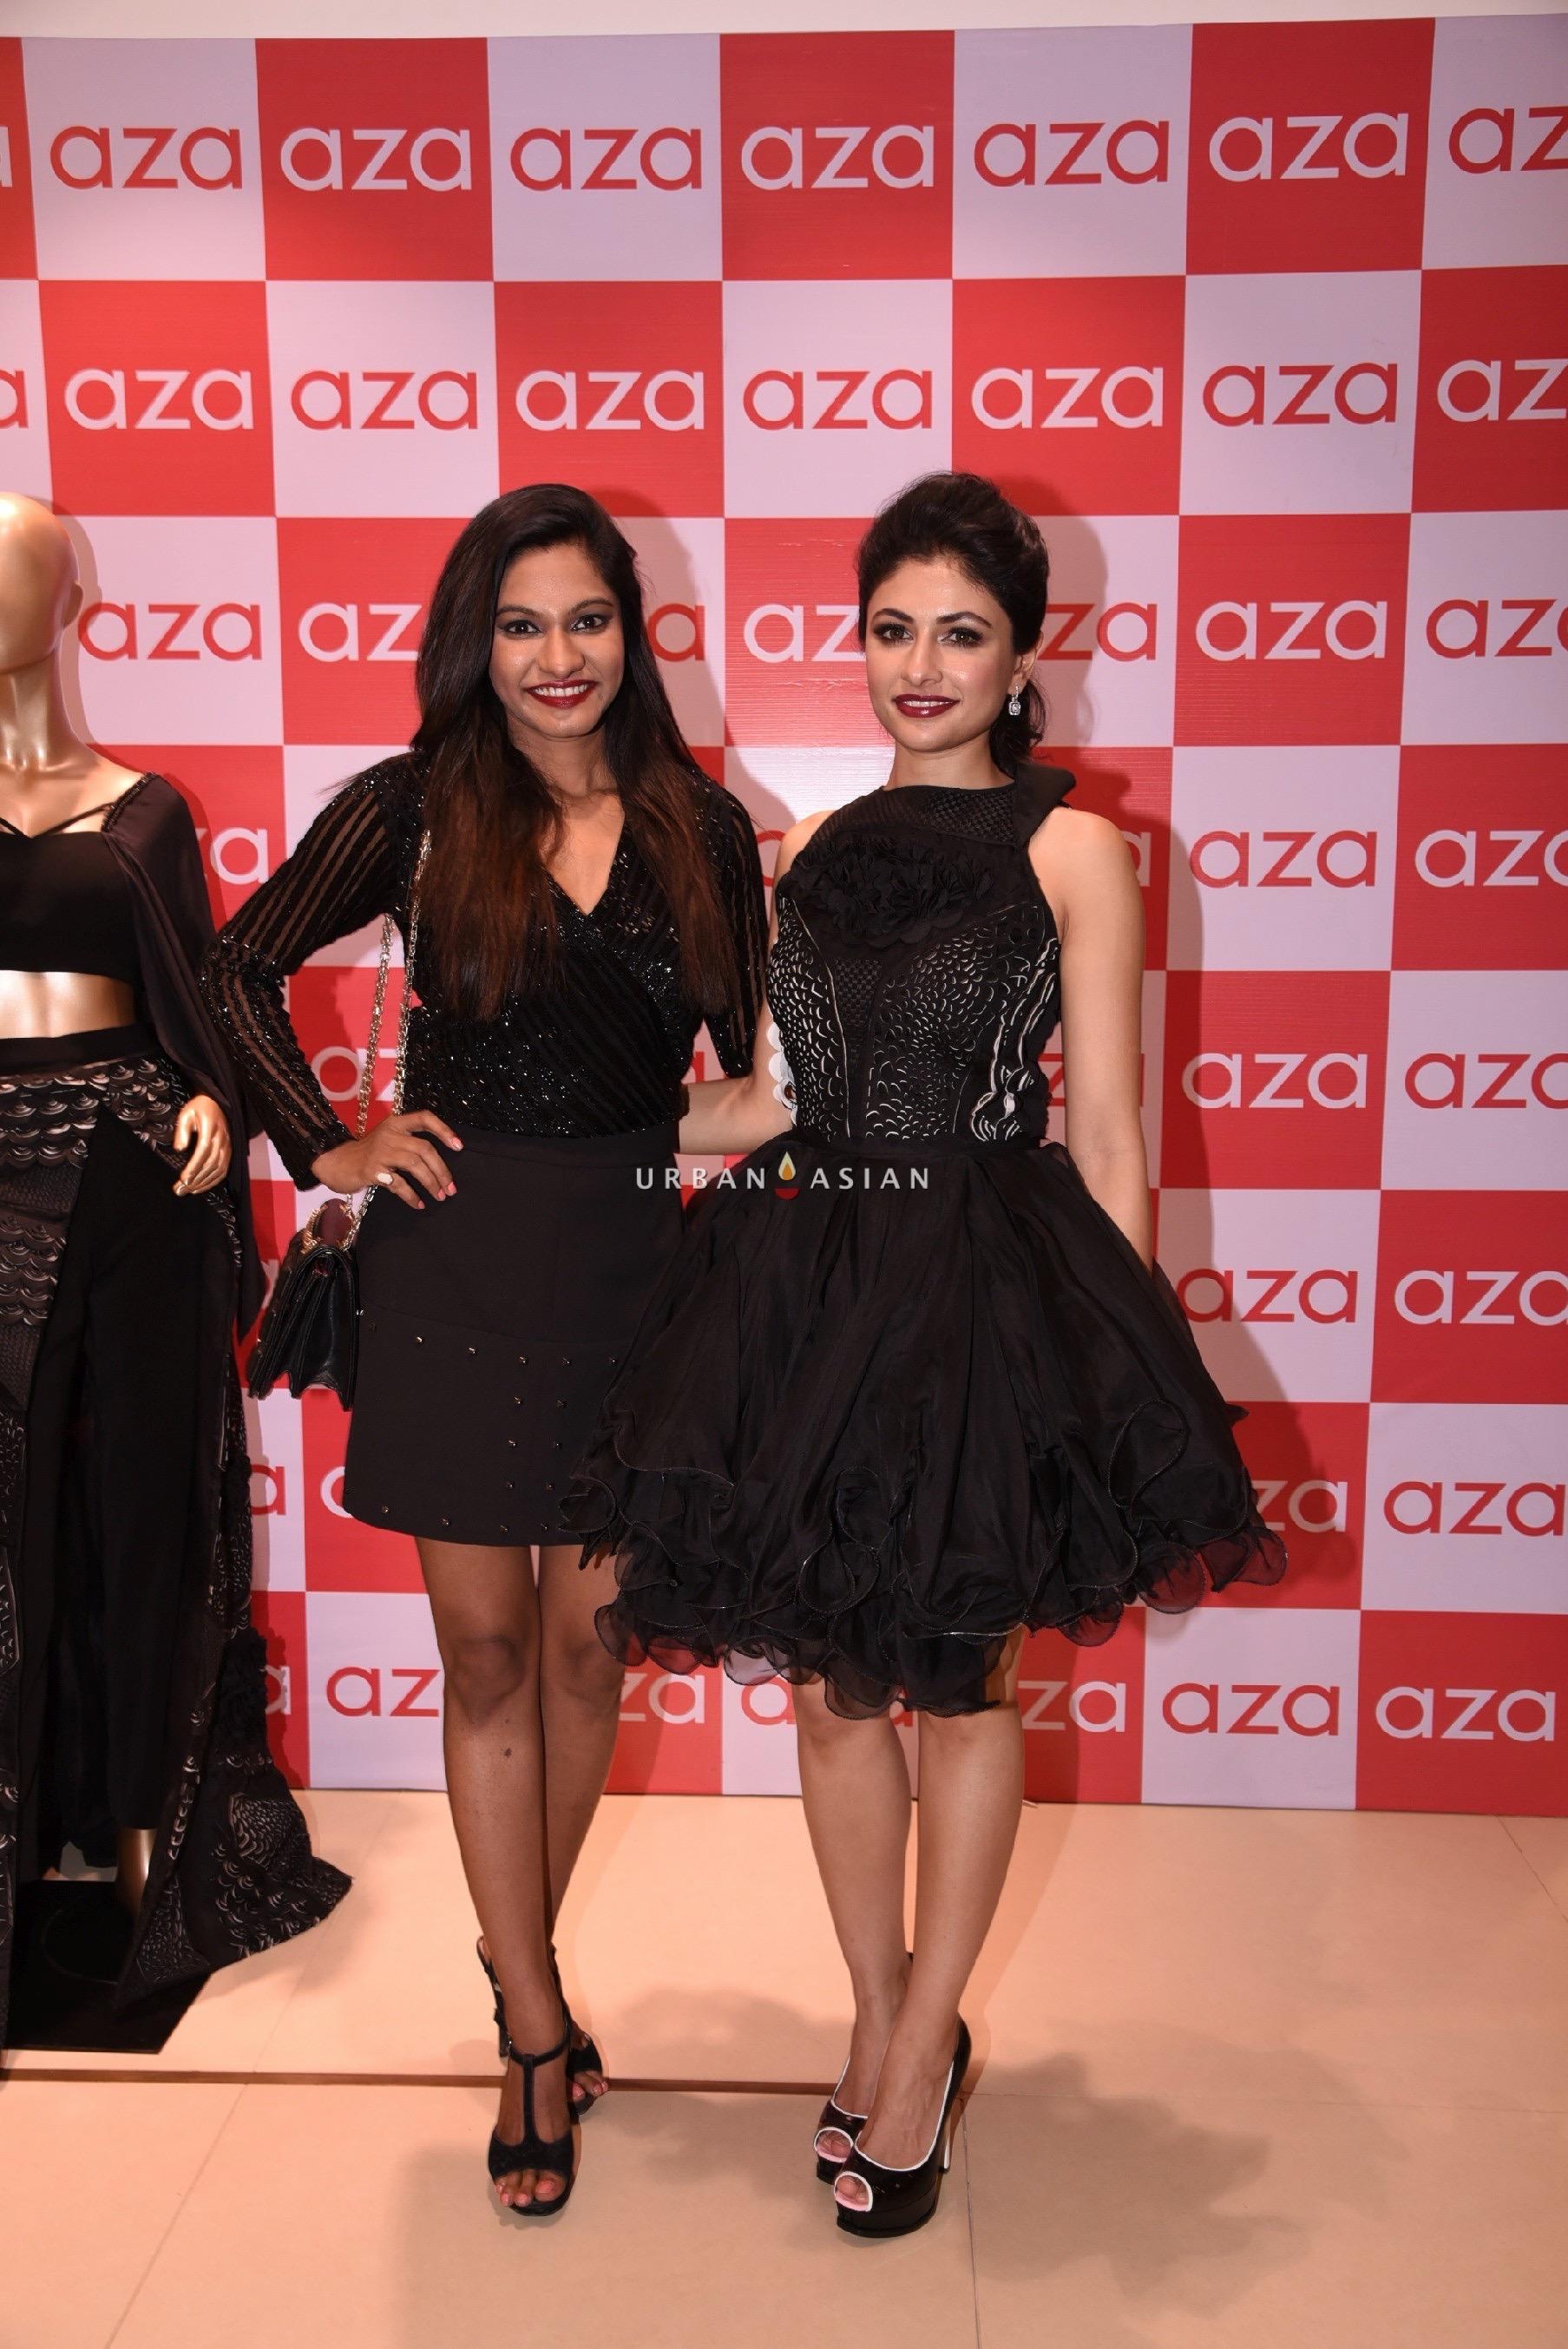 eshaa-amiin-devangi-nishar-parekh-creative-director-of-aza-eshaa-amiins-new-party-wear-launch-at-aza